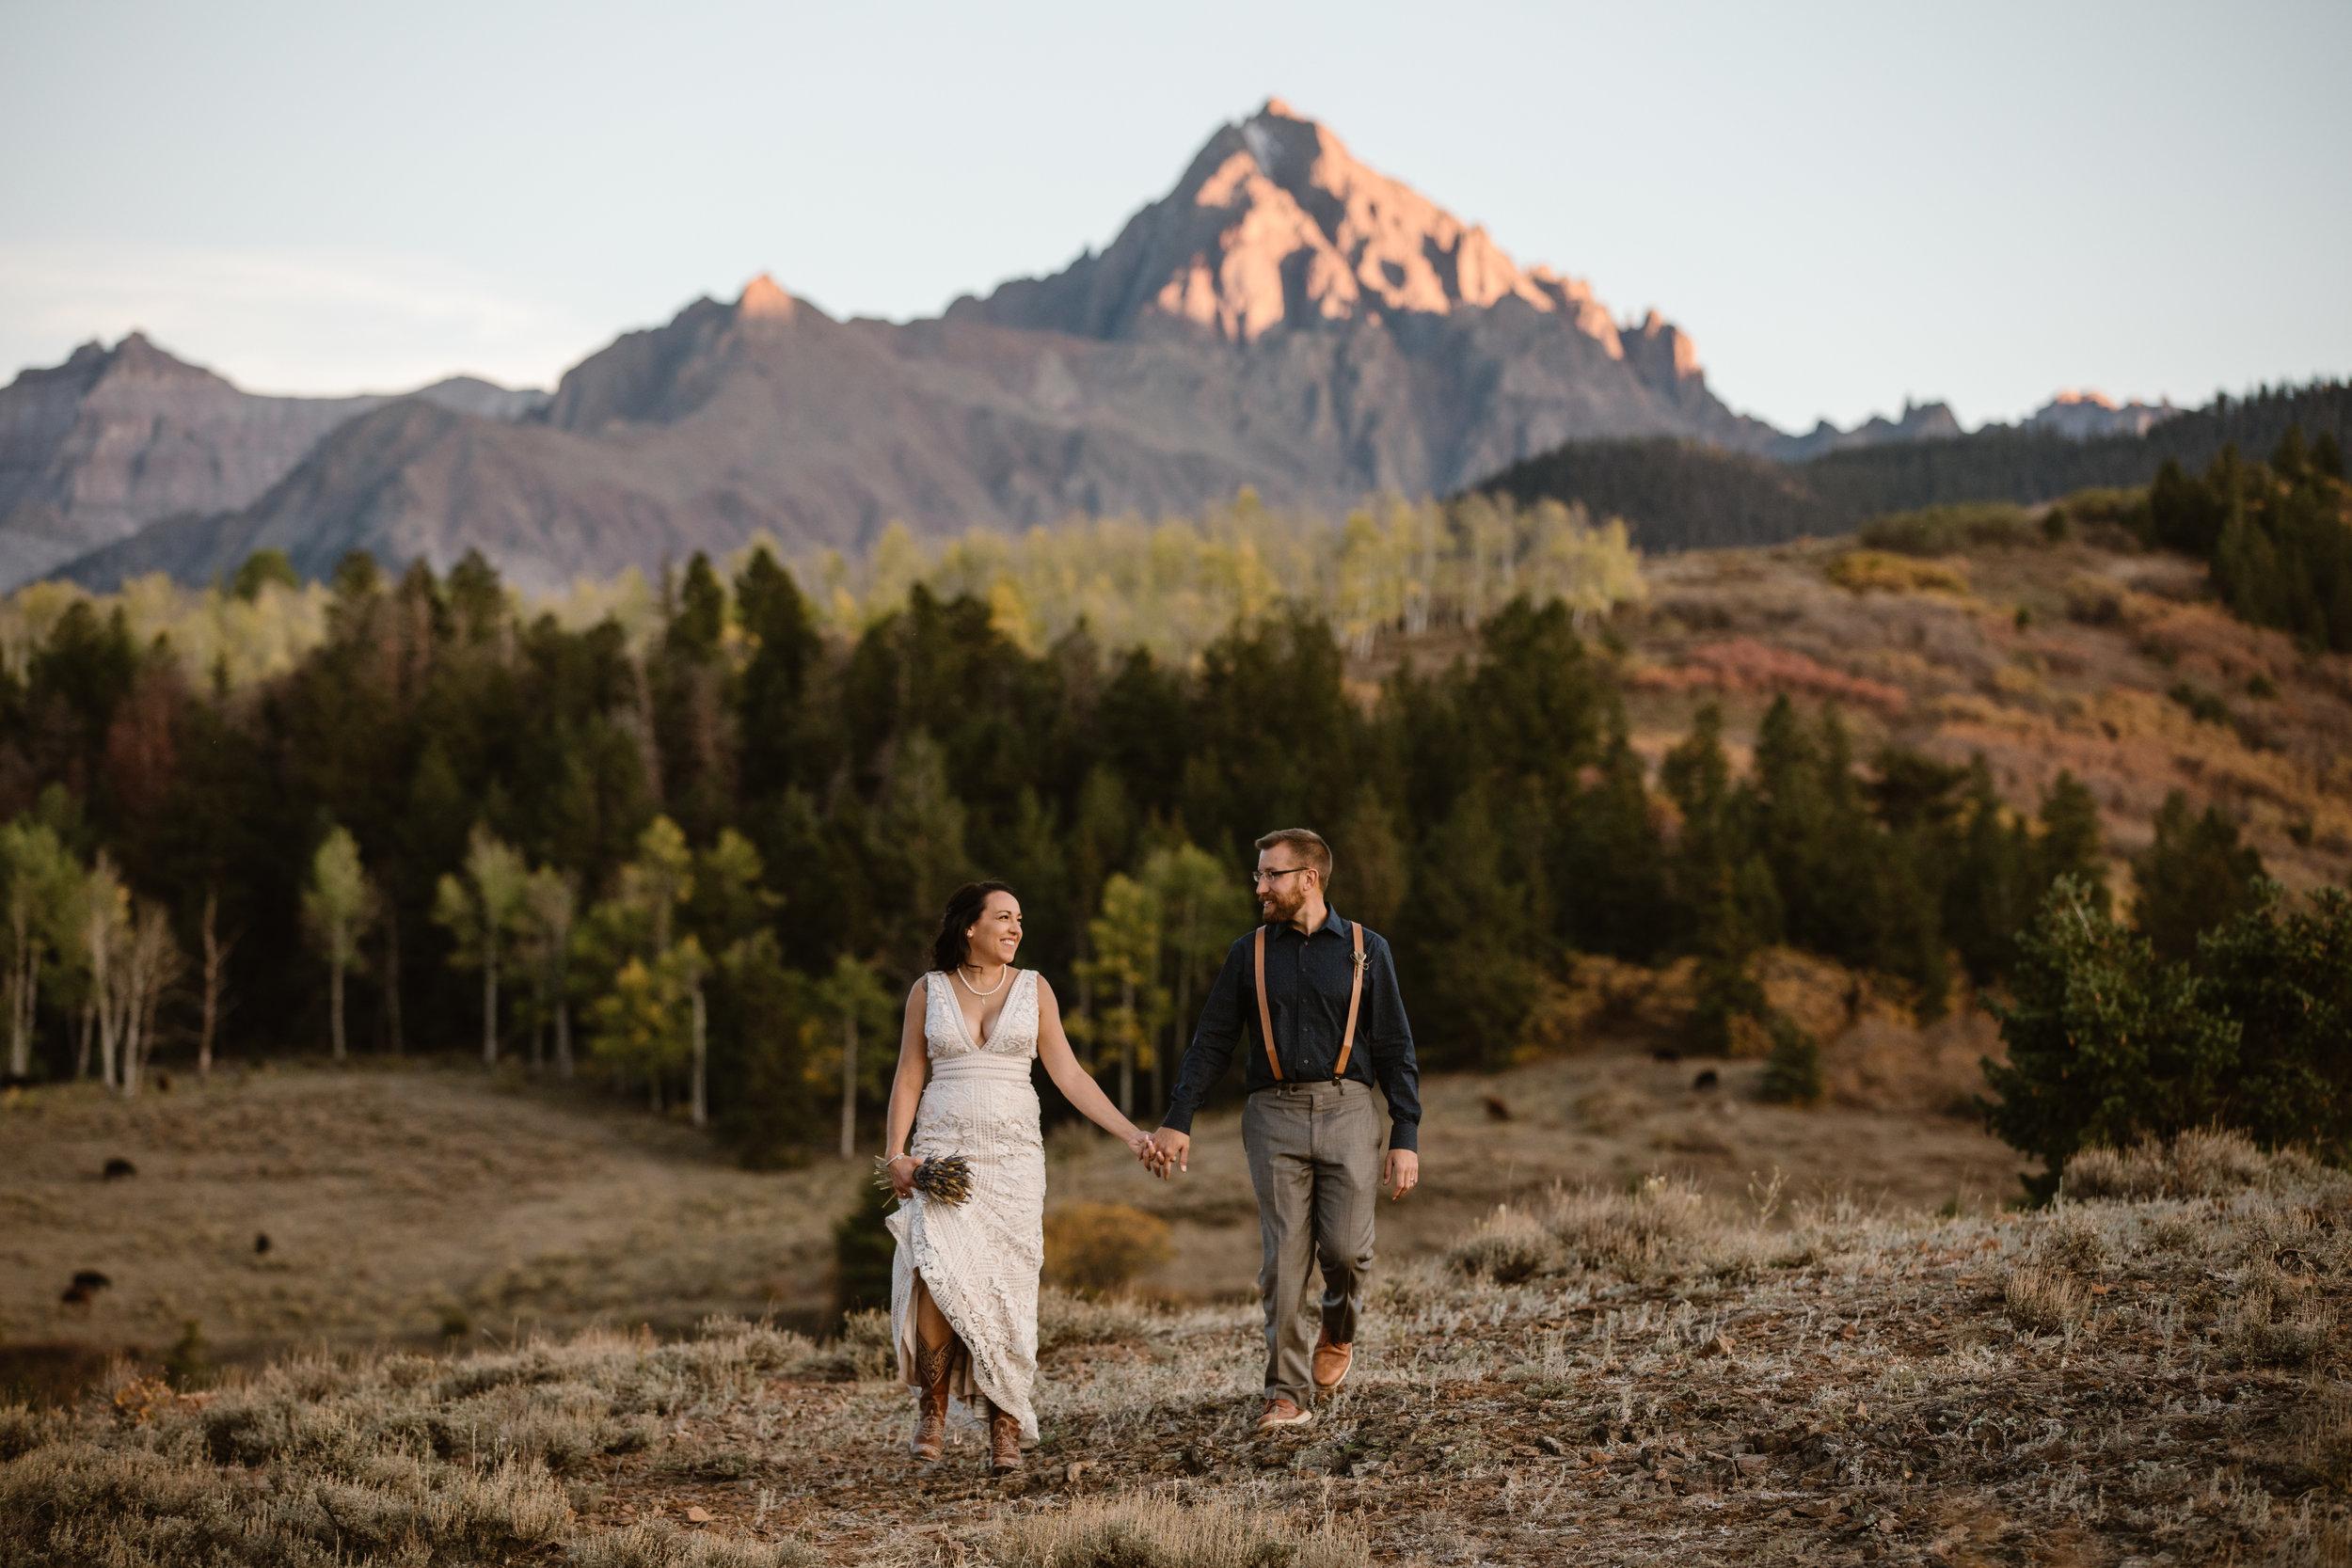 CM-Telluride-WeddingPhotographer-LeahandAshtonPhotography-556.jpg